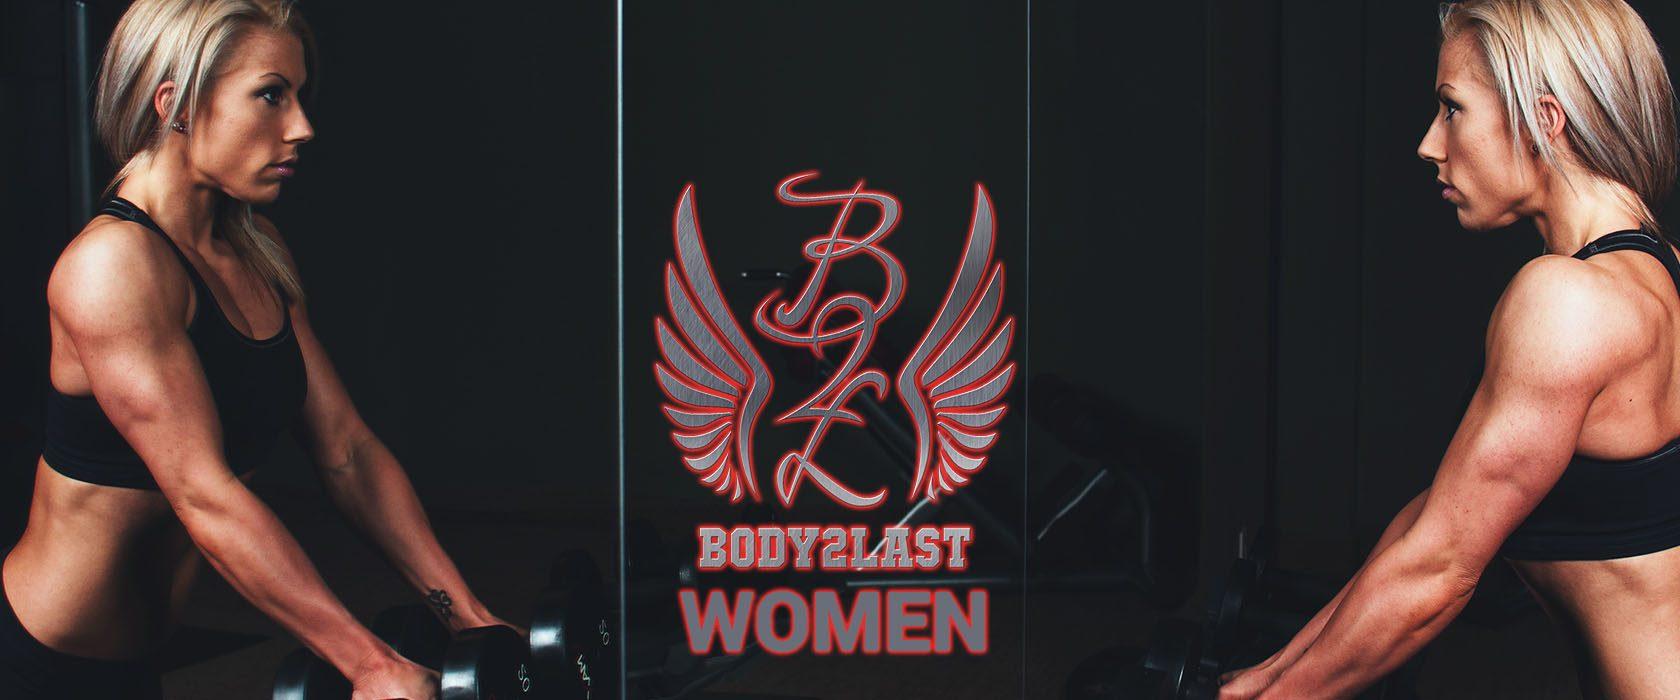 B2L_WOMEN